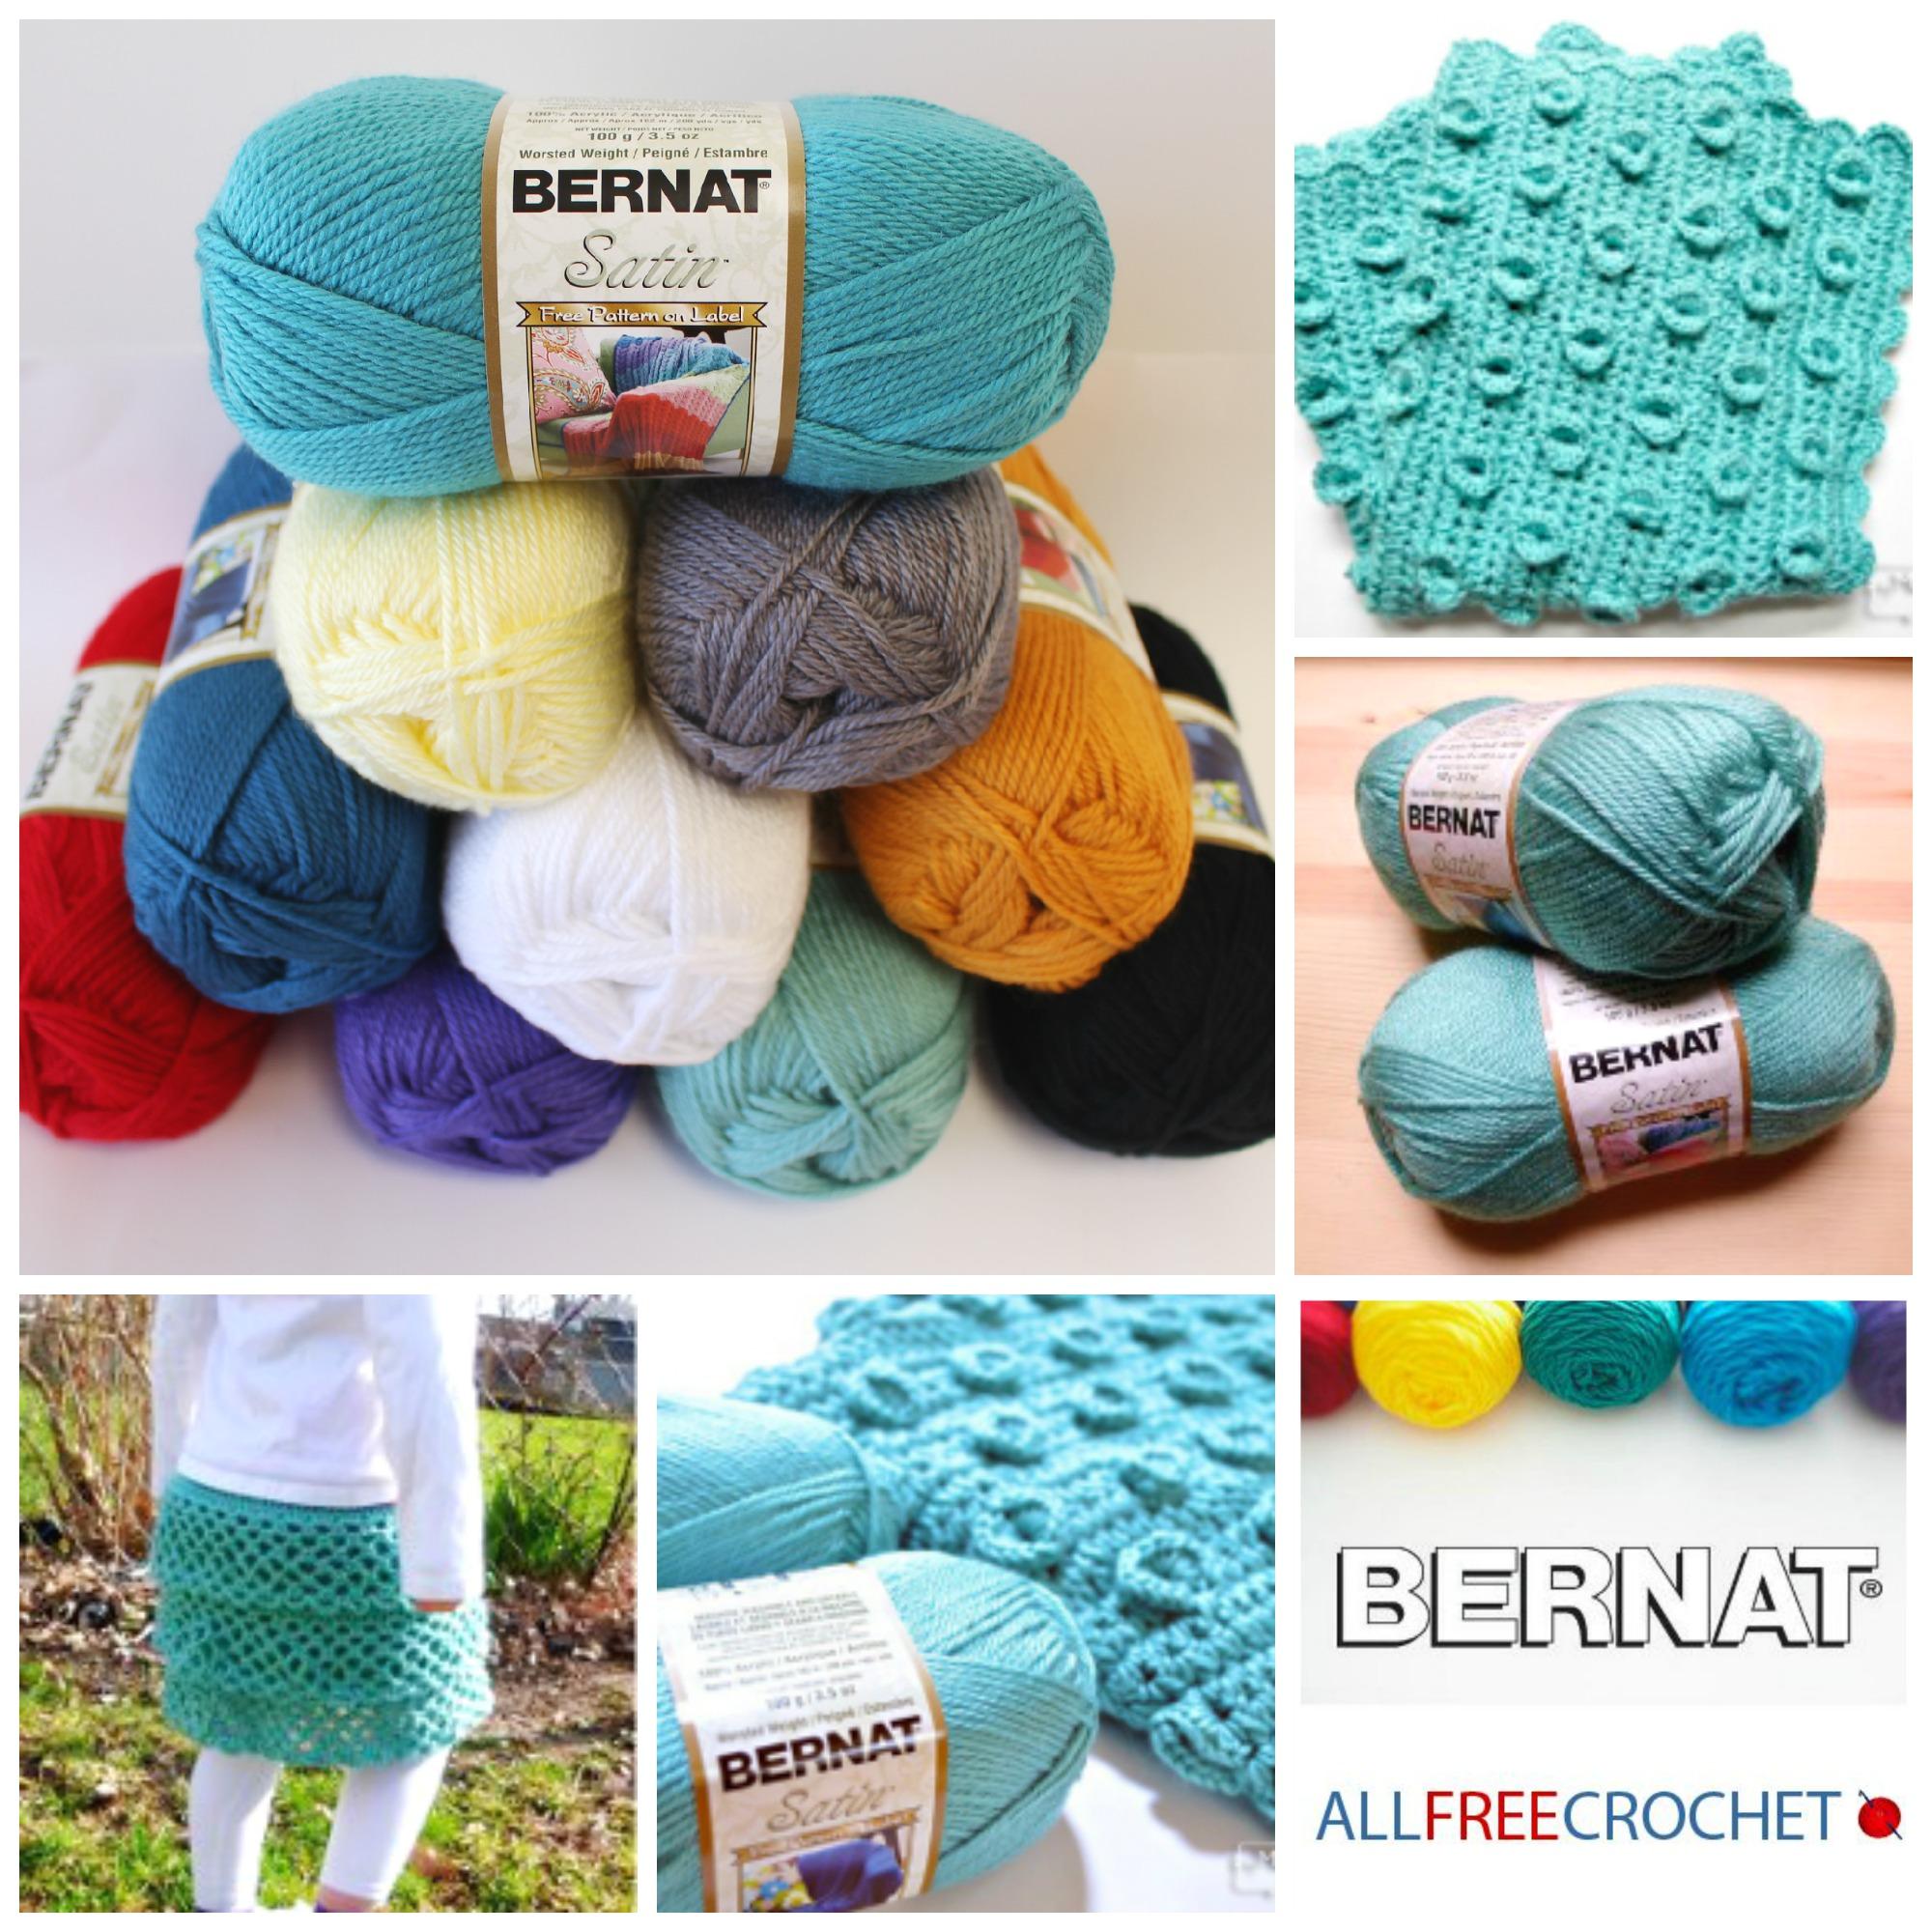 Your New Favorite Yarn: Bernat Satin - Stitch and Unwind